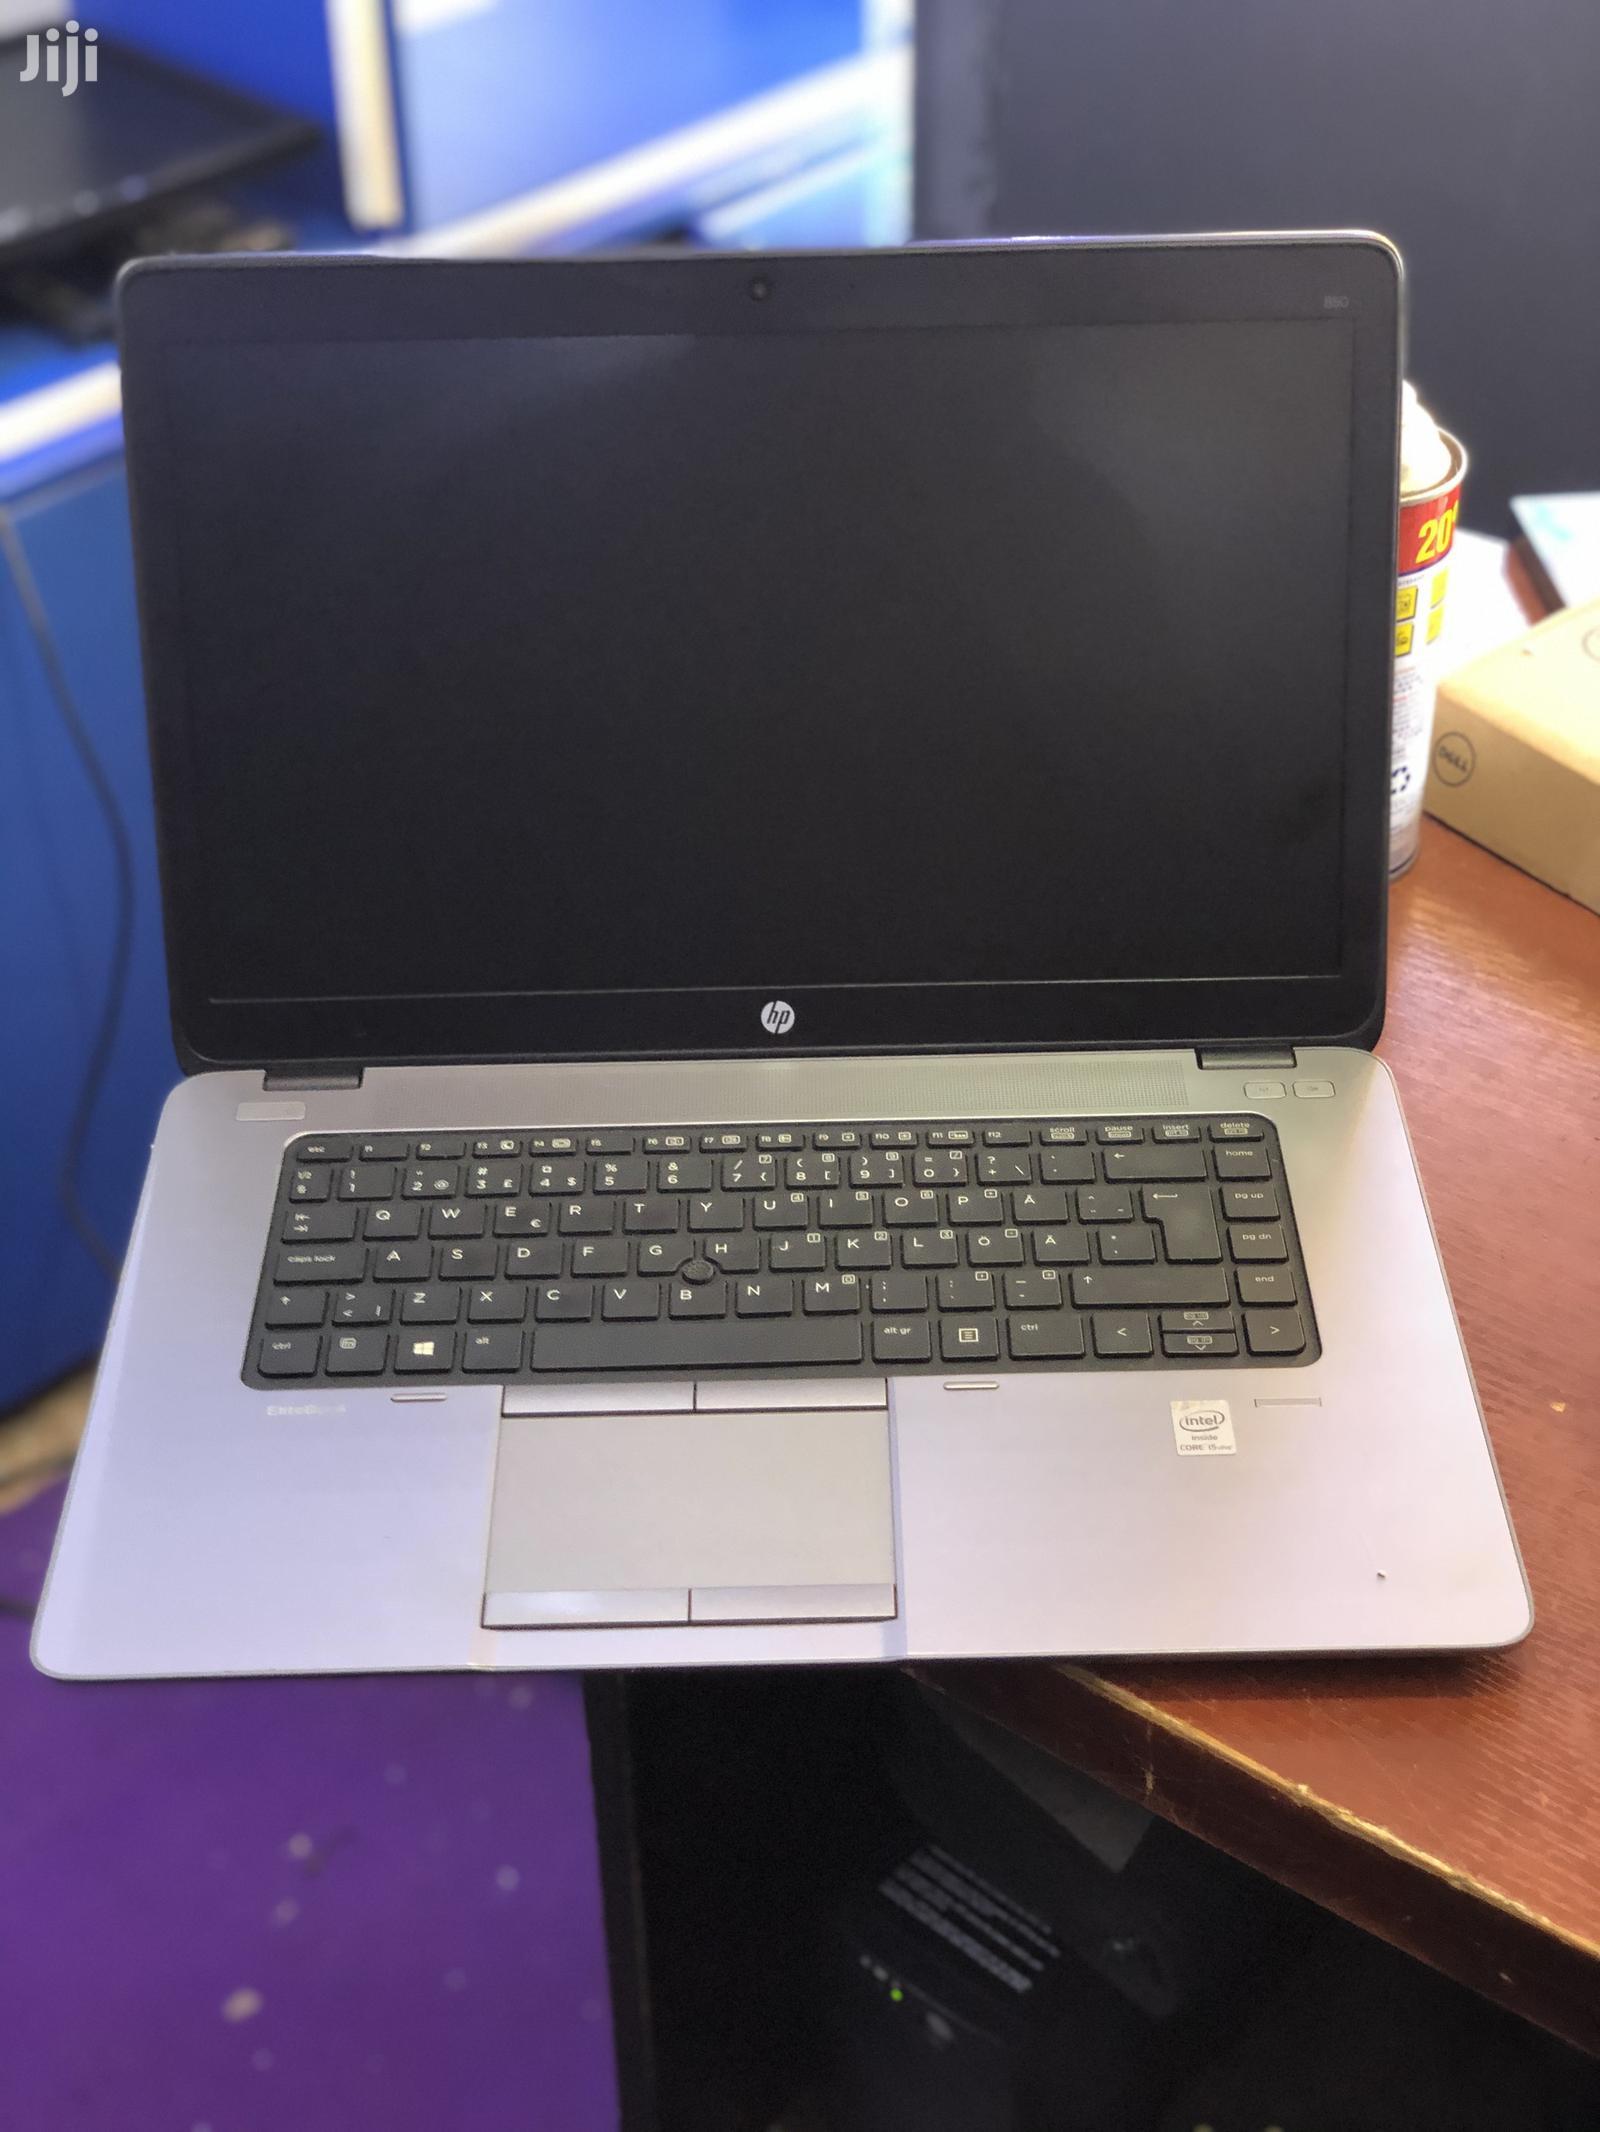 Laptop HP EliteBook 850 G1 8GB Intel Core i5 SSHD (Hybrid) 500GB | Laptops & Computers for sale in Kampala, Central Region, Uganda